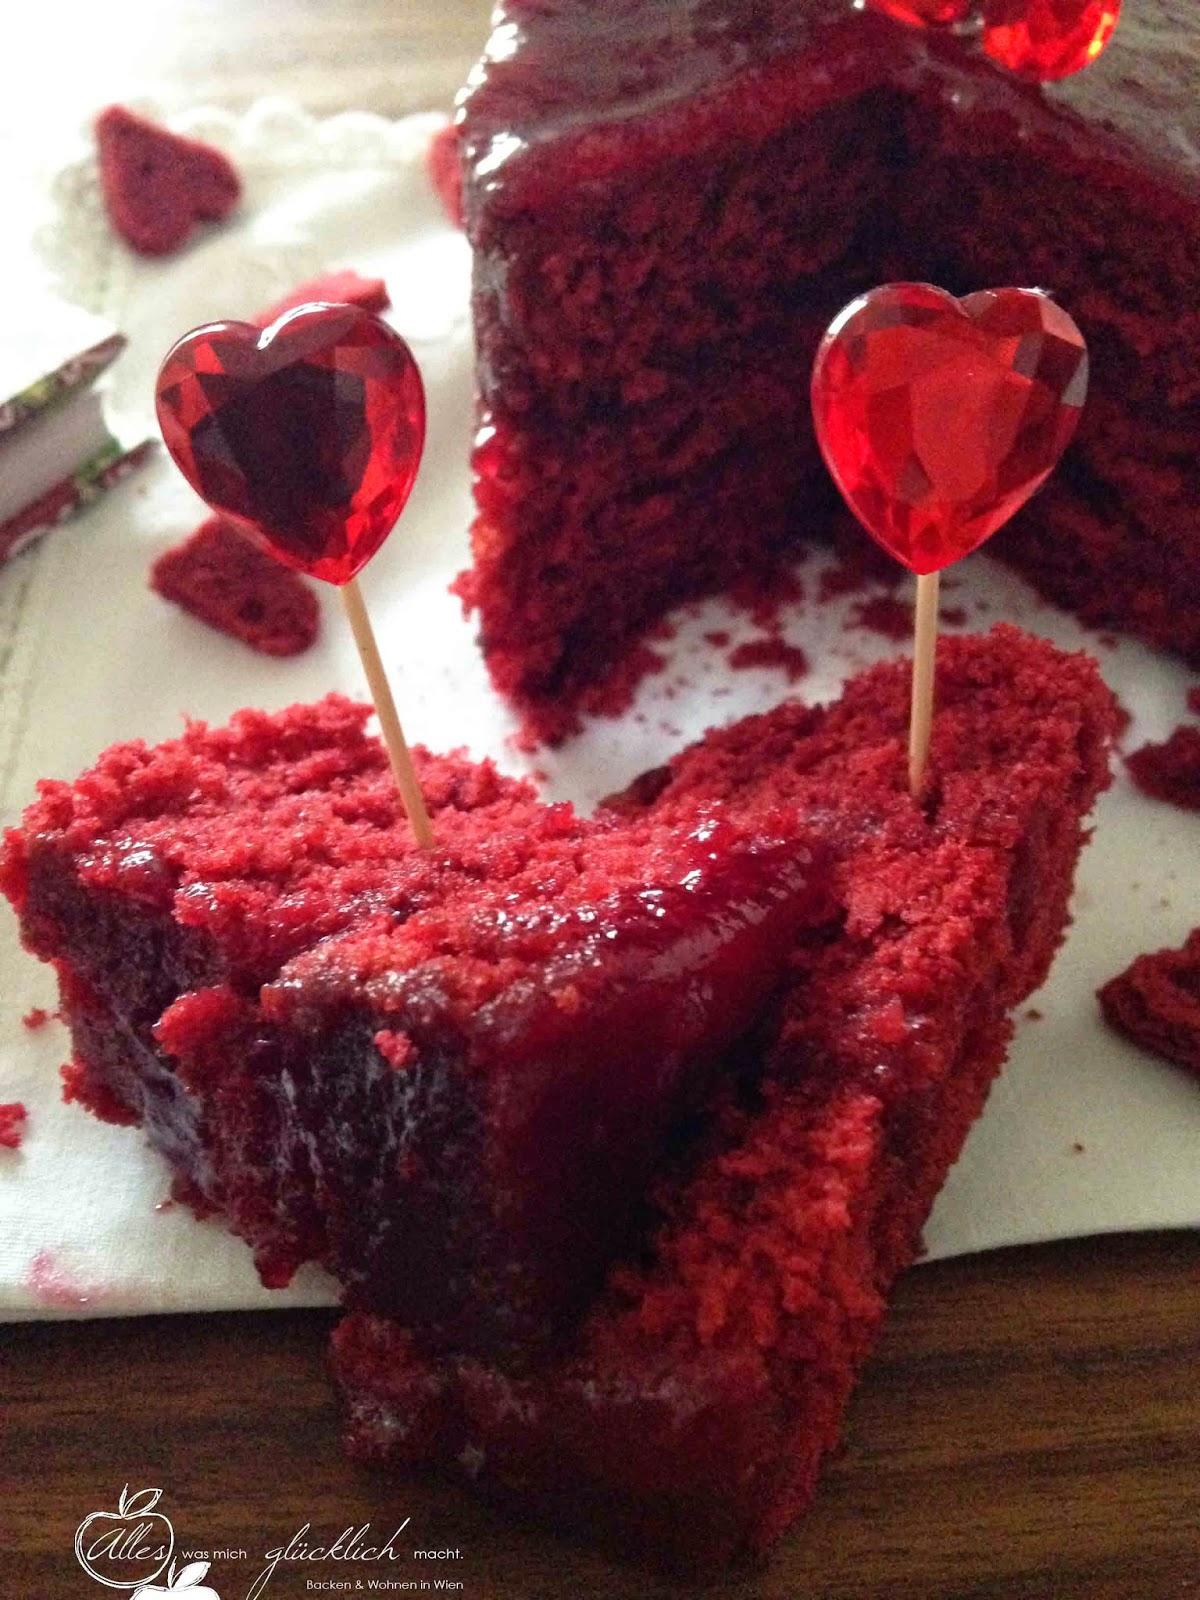 red velvet cake oder simple gesagt roter samt herzkuchen alles was mich gl cklich macht. Black Bedroom Furniture Sets. Home Design Ideas